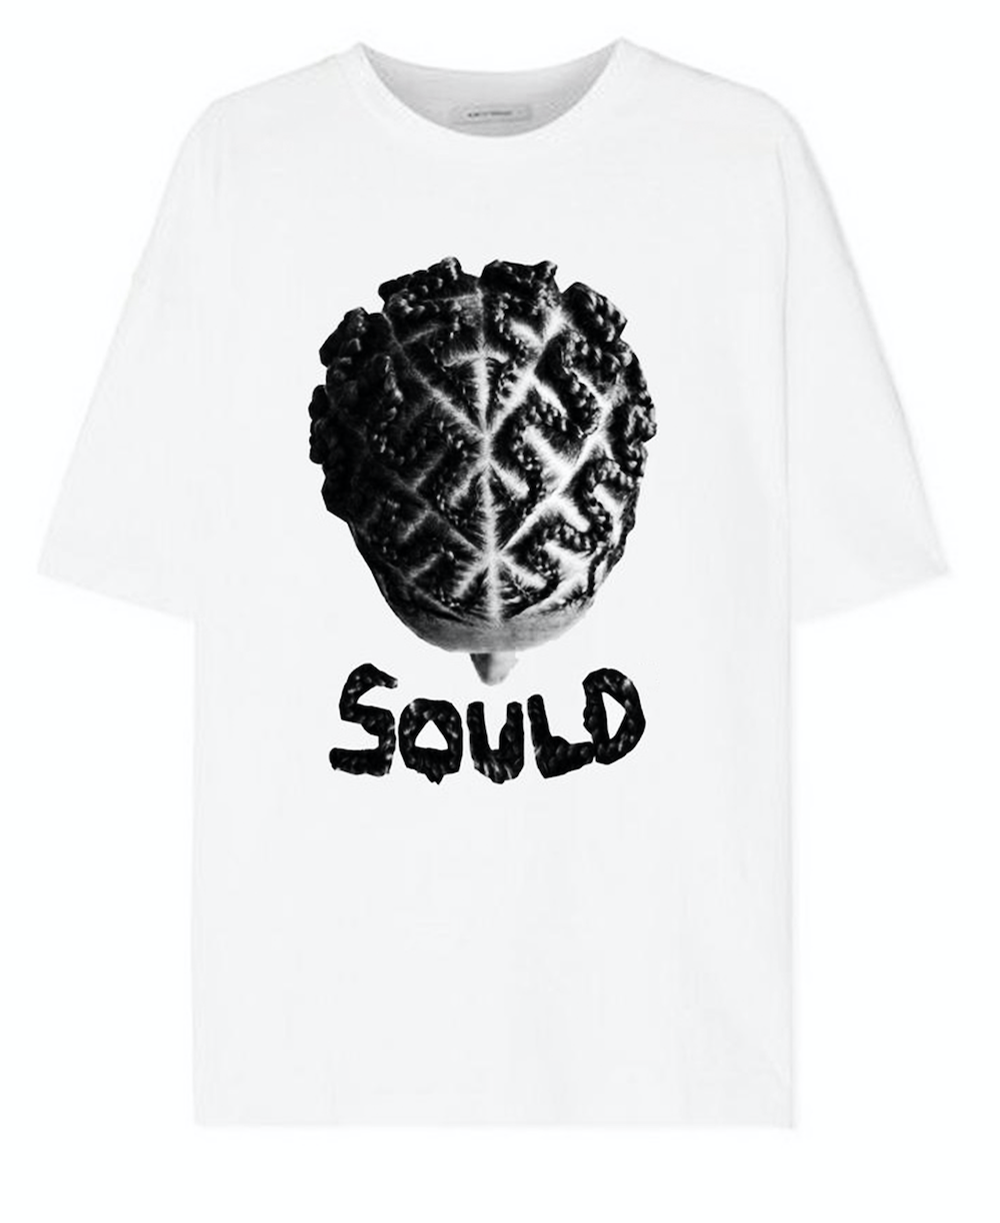 Image of Soul'd Dreams 'Protective' T-shirt